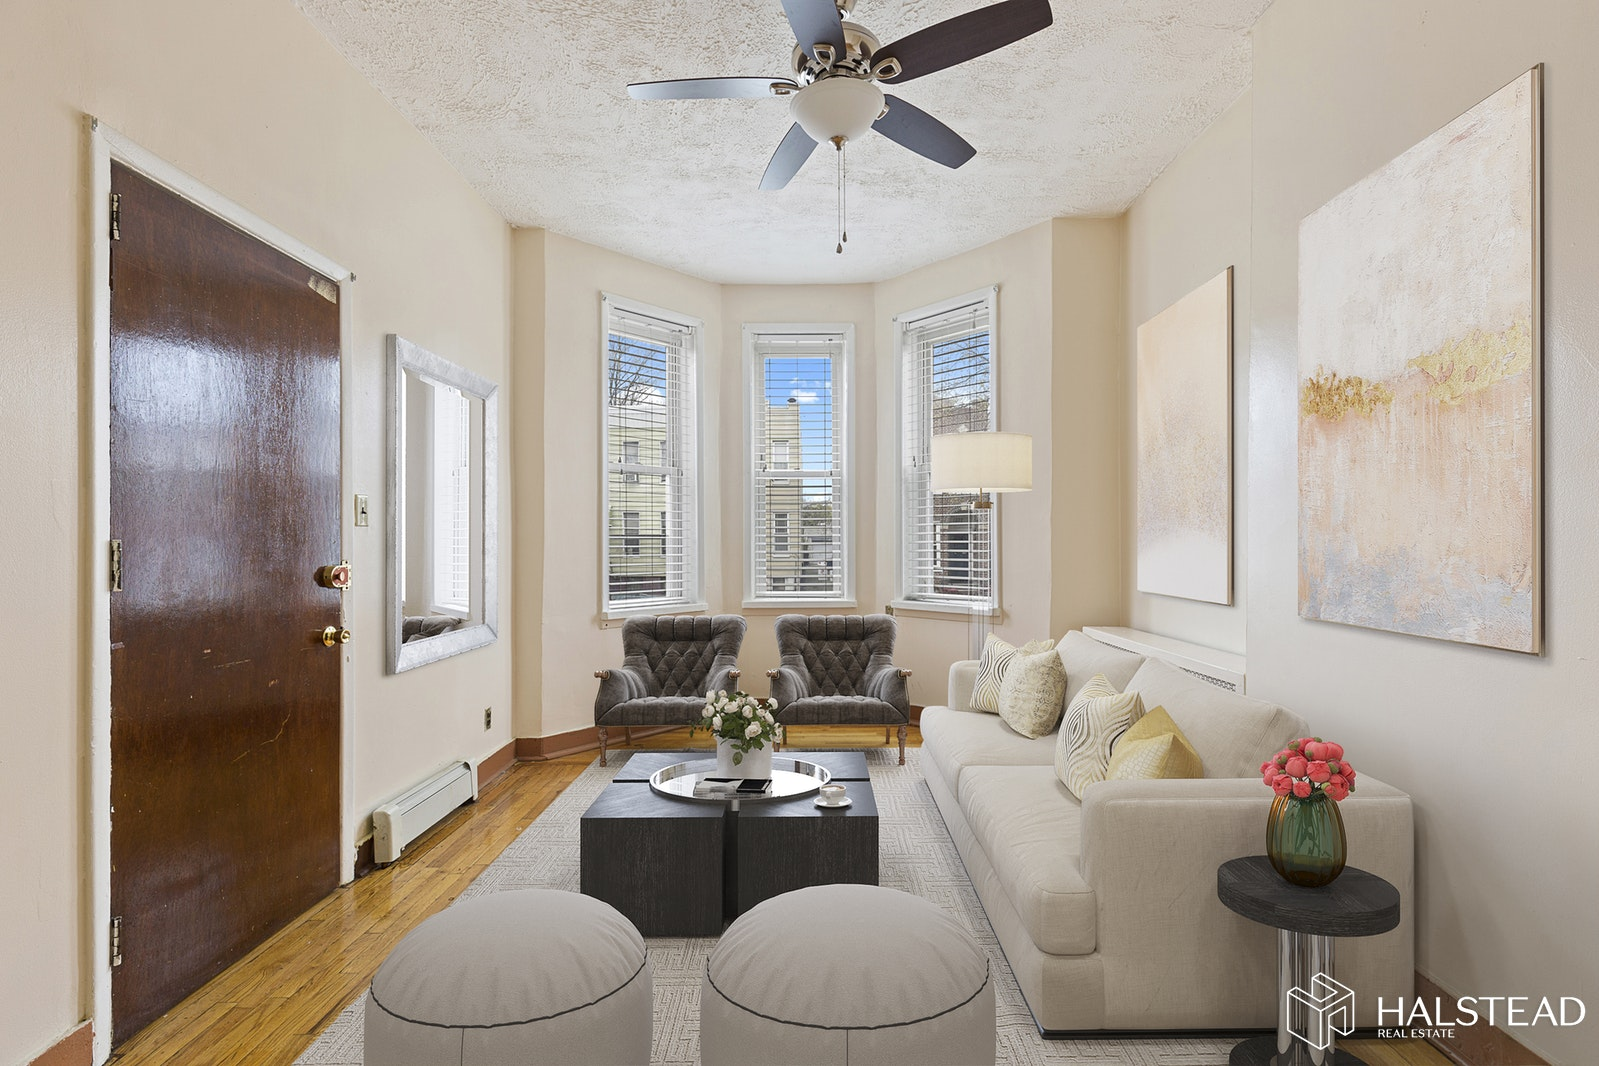 1376 Park Place, Apt 1, Brooklyn, New York 11213